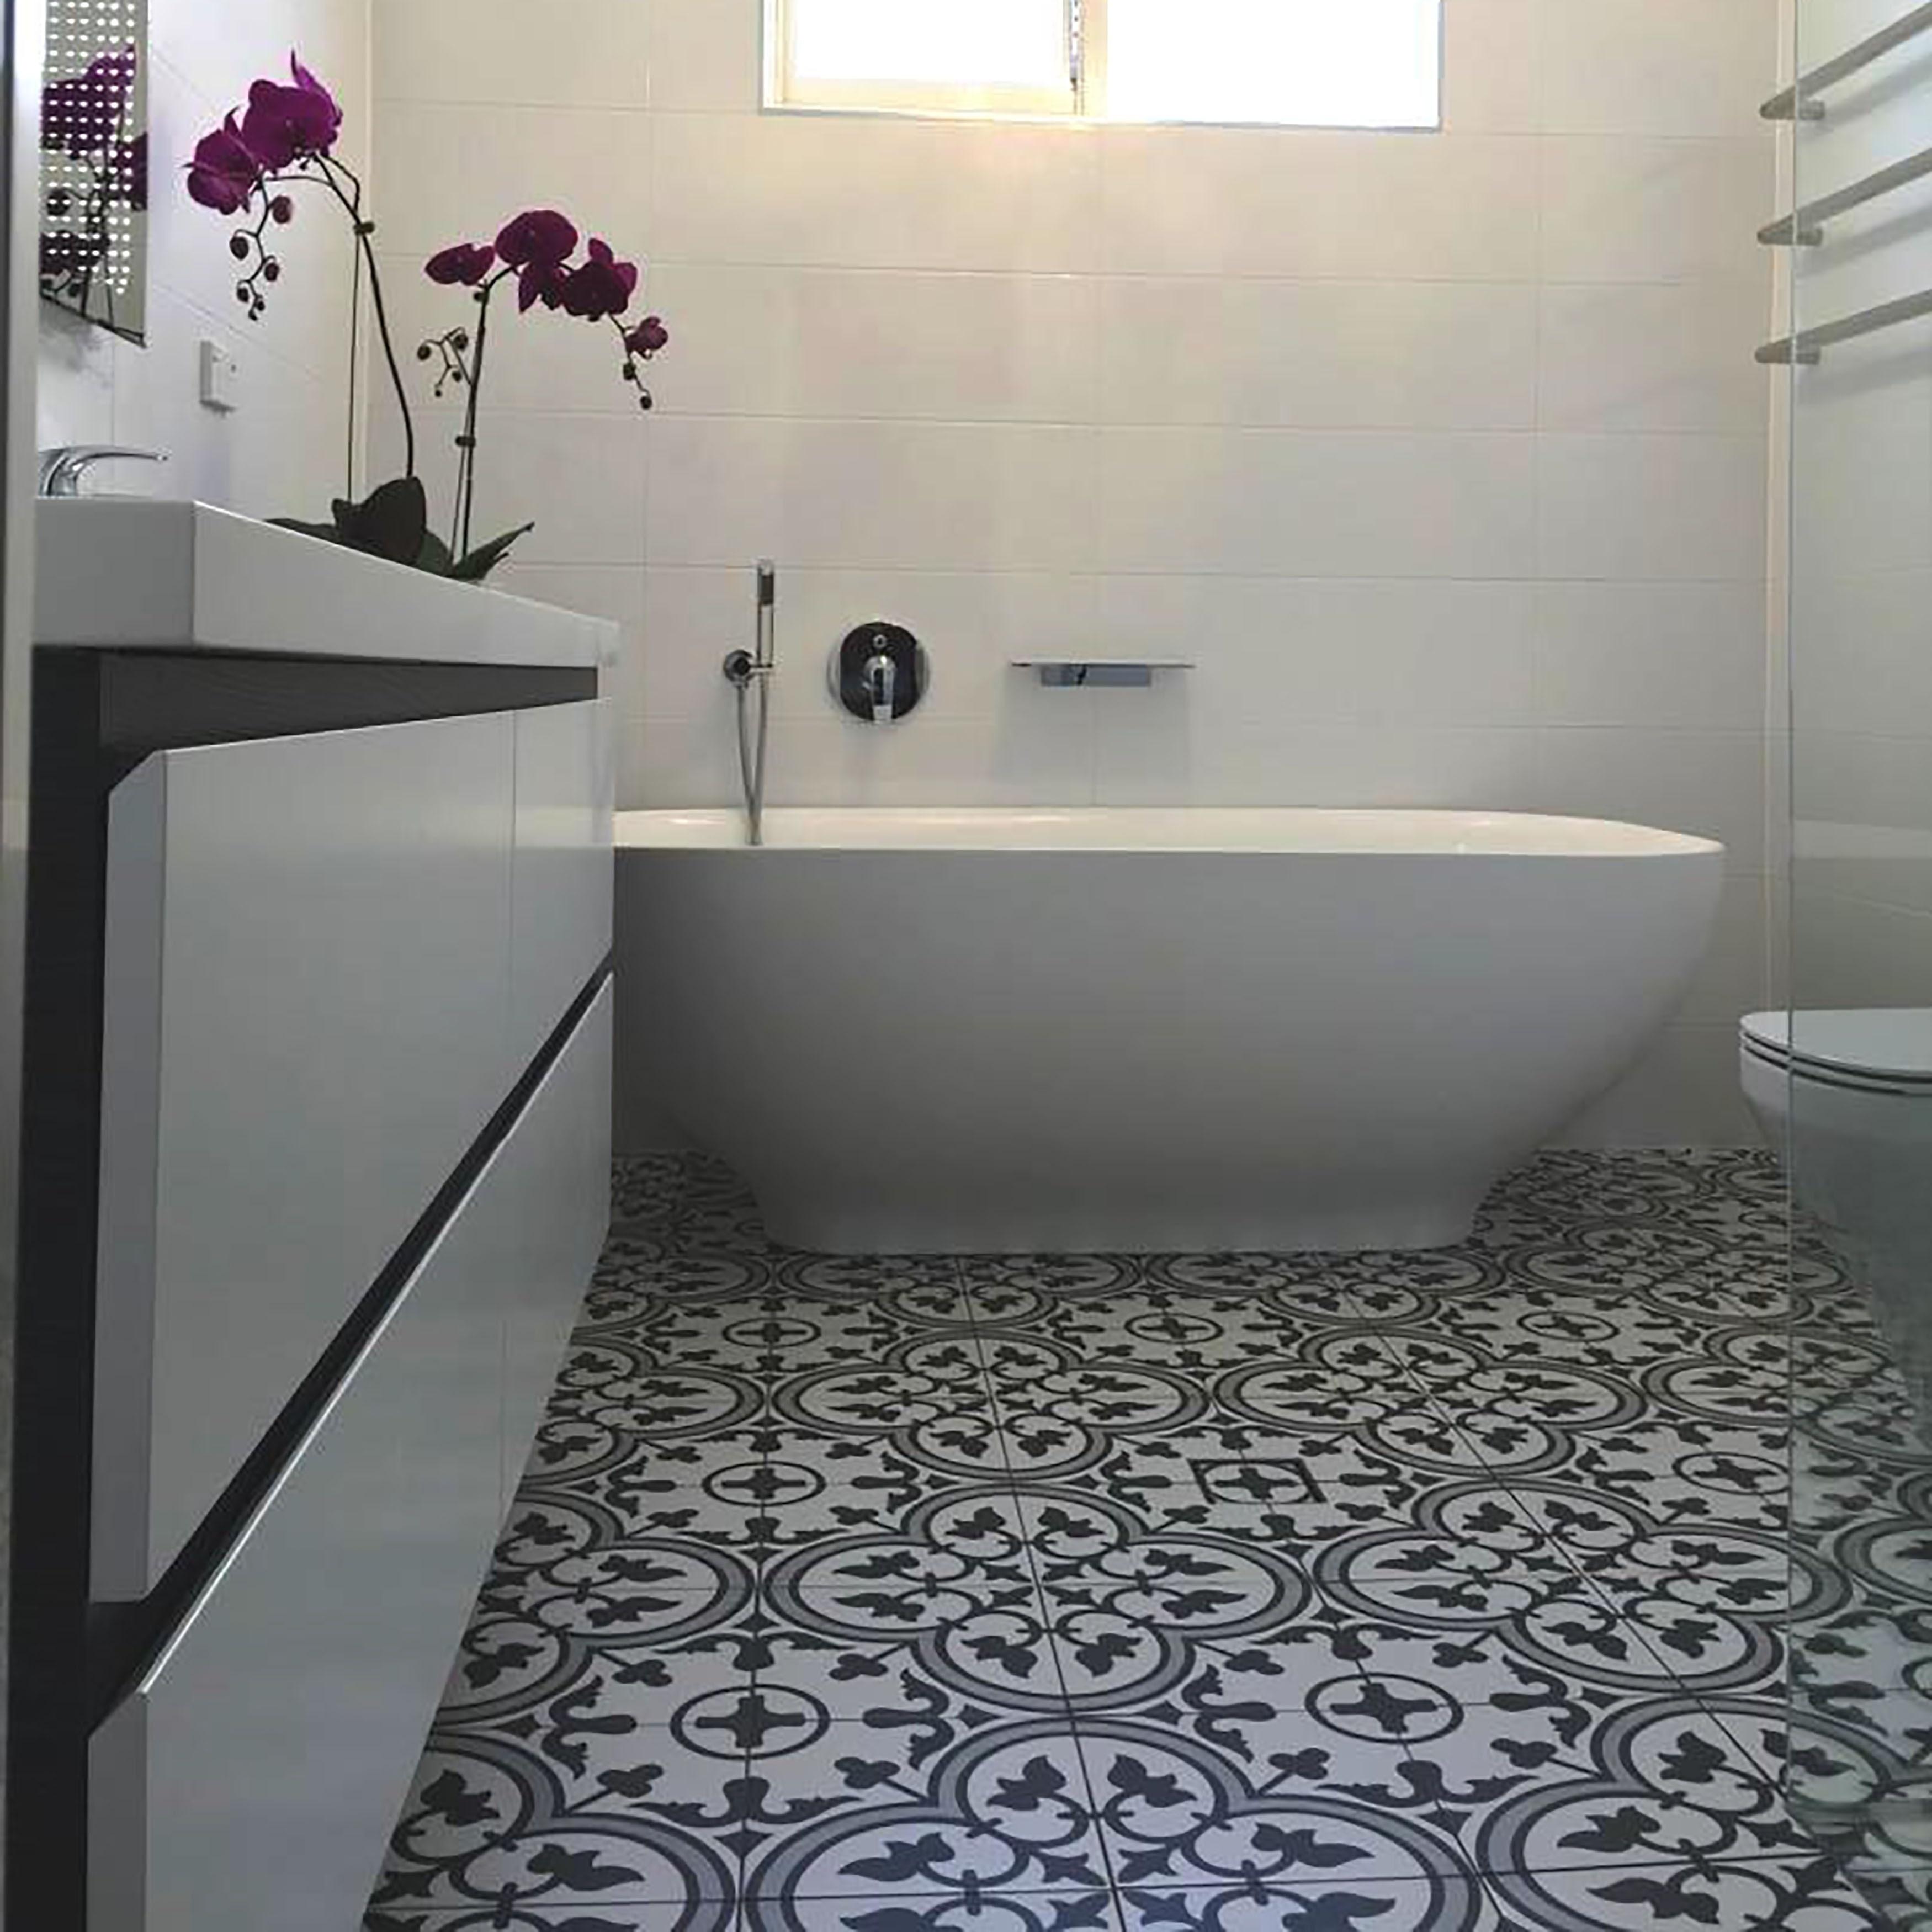 Shop SomerTile 9.75 x 9.75-in Art Grey Porcelain Tile (10.76 sqft./case) - Free Shipping On Orders Over $45 - Overstock - 10528468